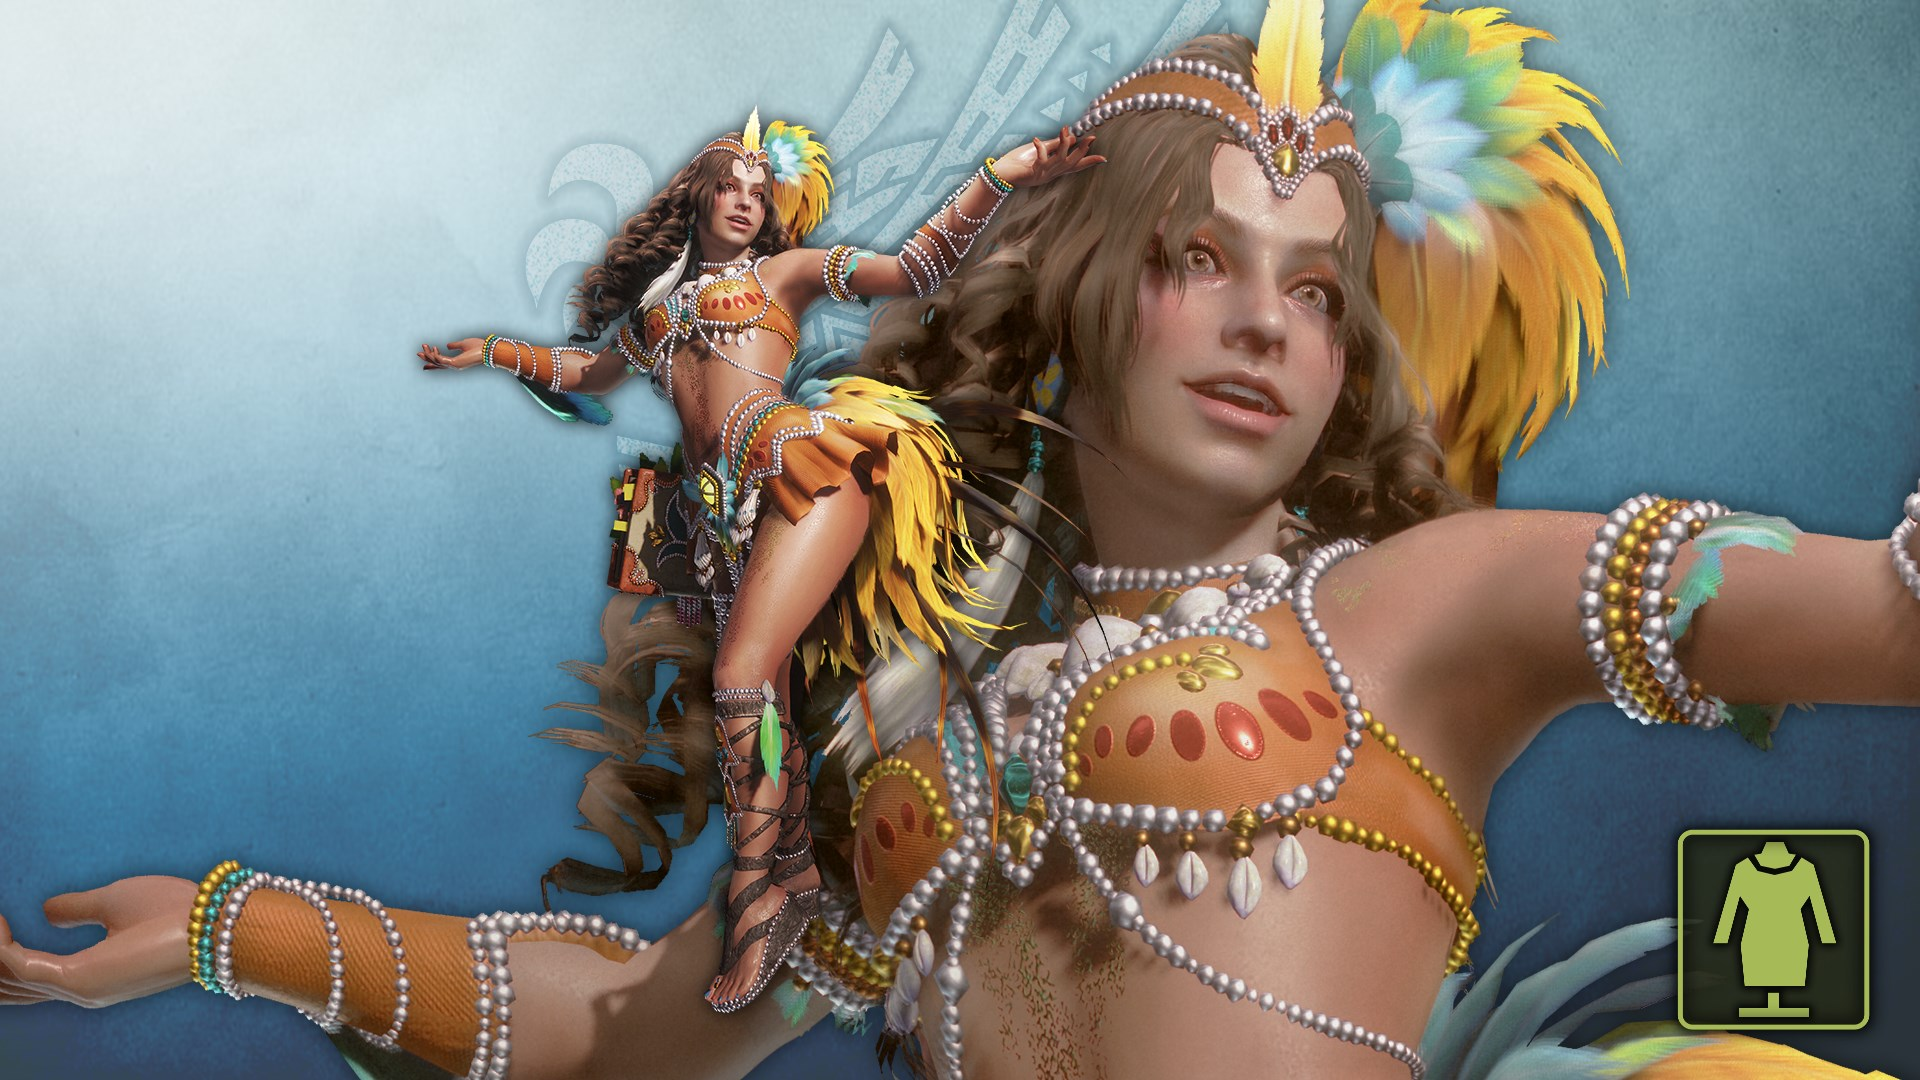 The Handler's Festive Samba Costume